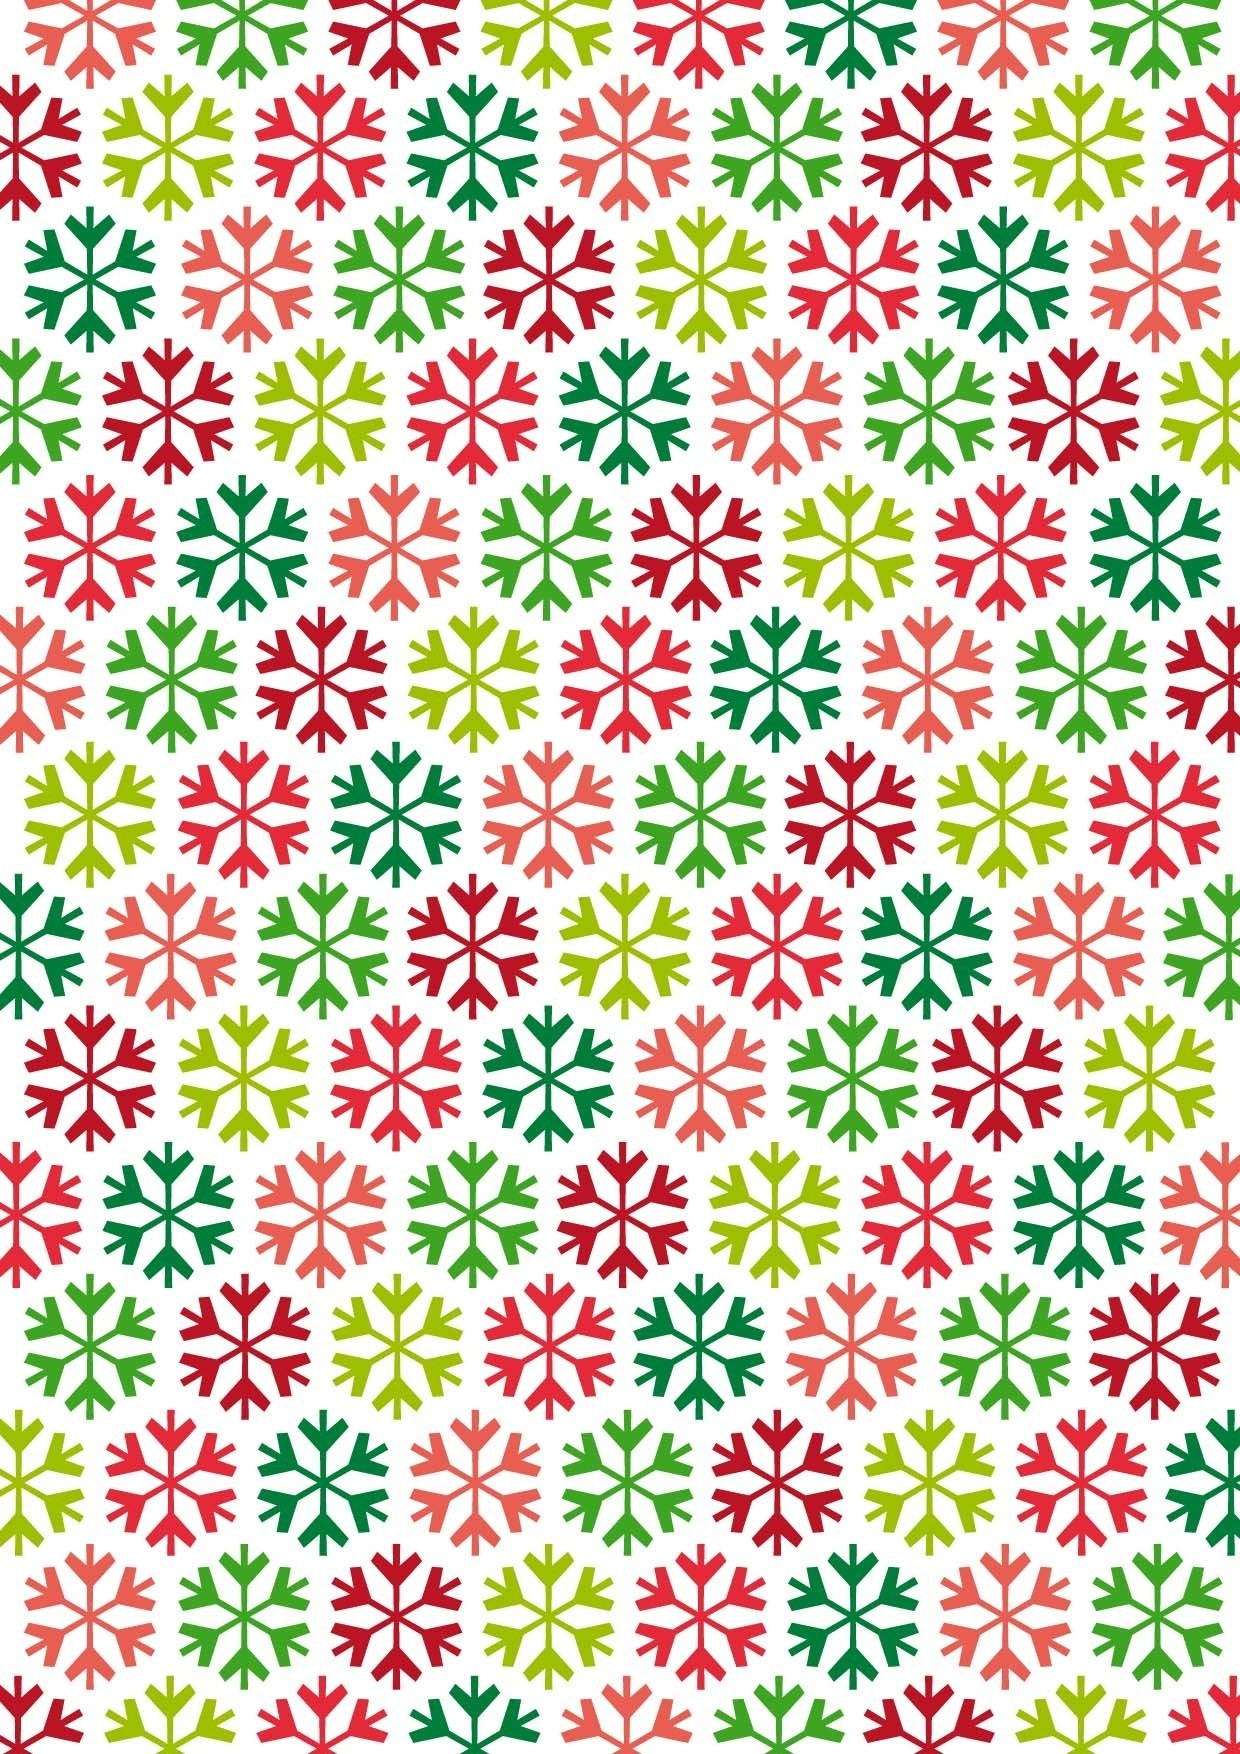 Free Printable Christmas Paper Fun For With Regard To On | Parkspfe - Free Printable Santa Paper